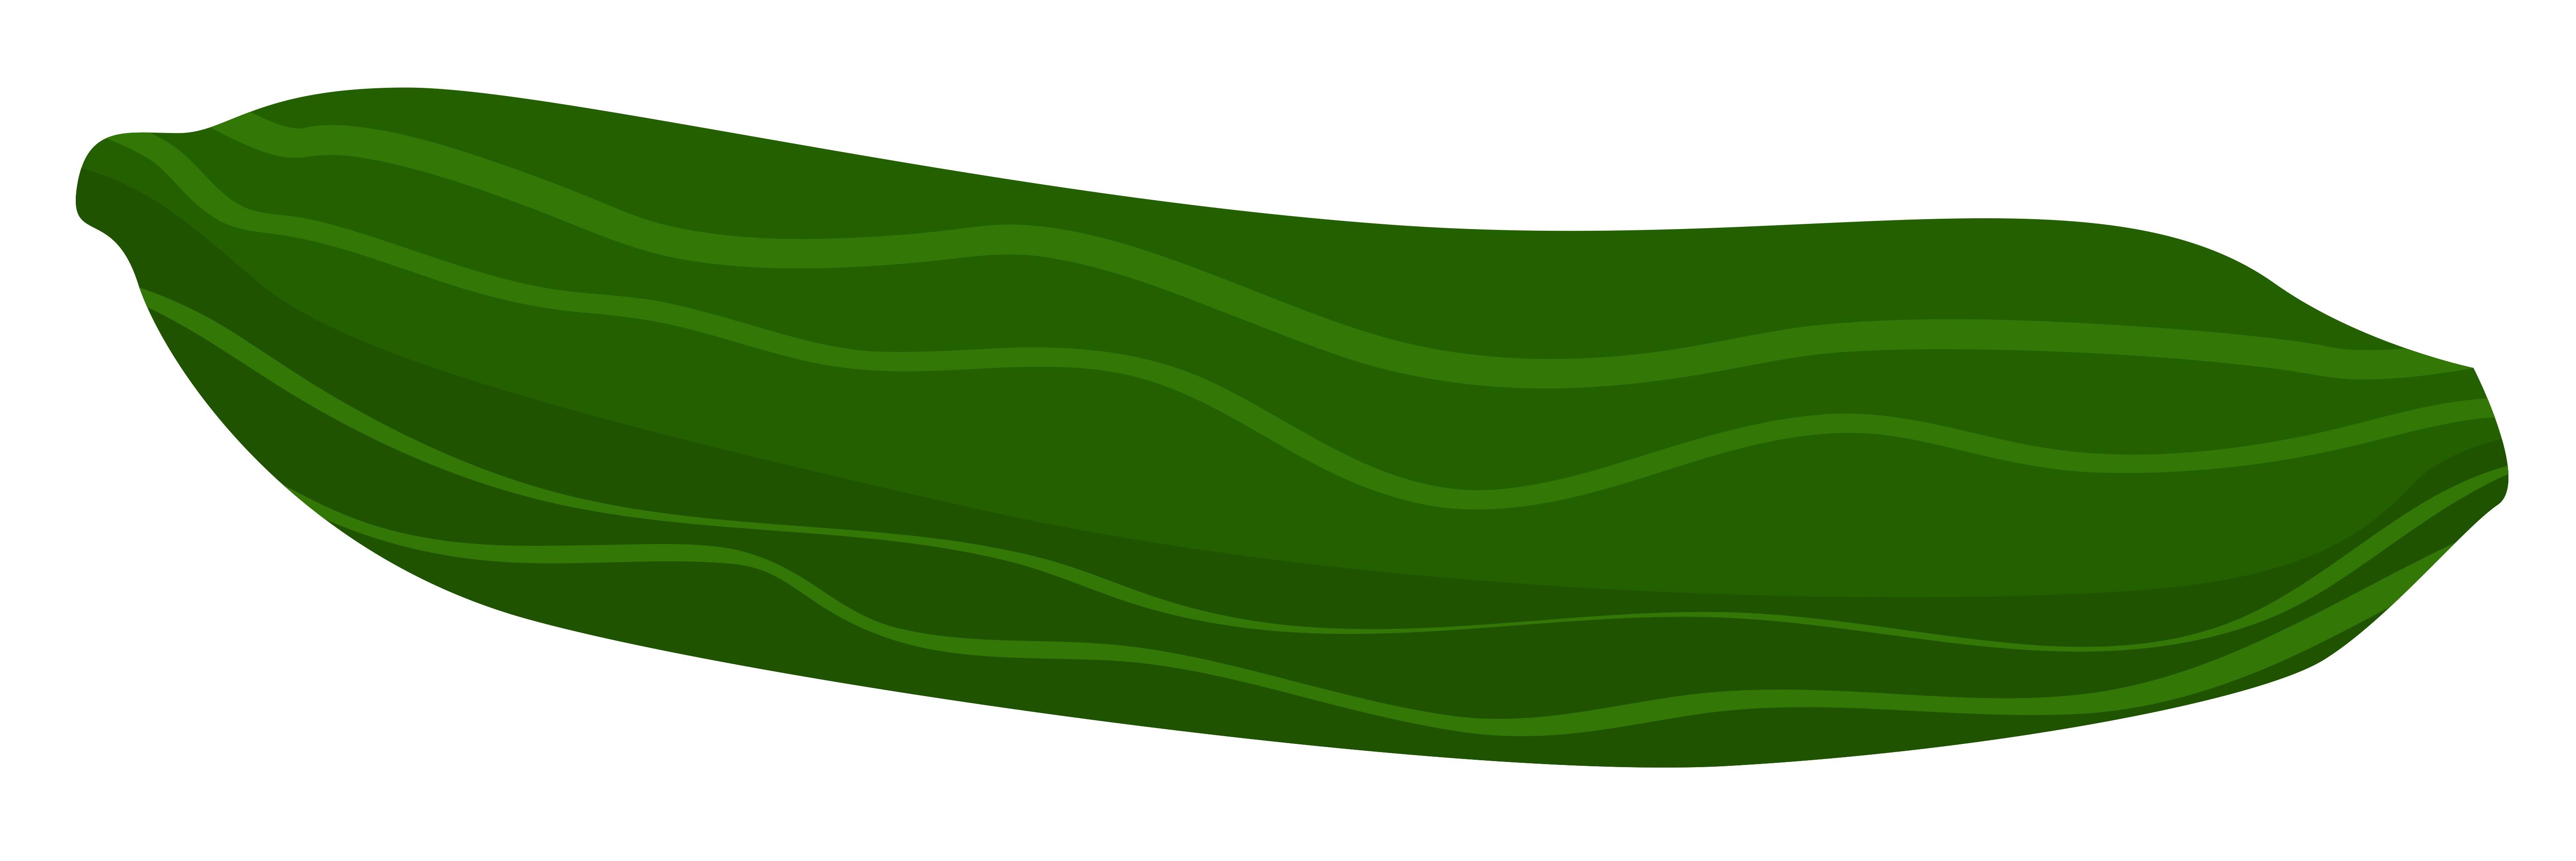 Cucumber clipart kiaavto image